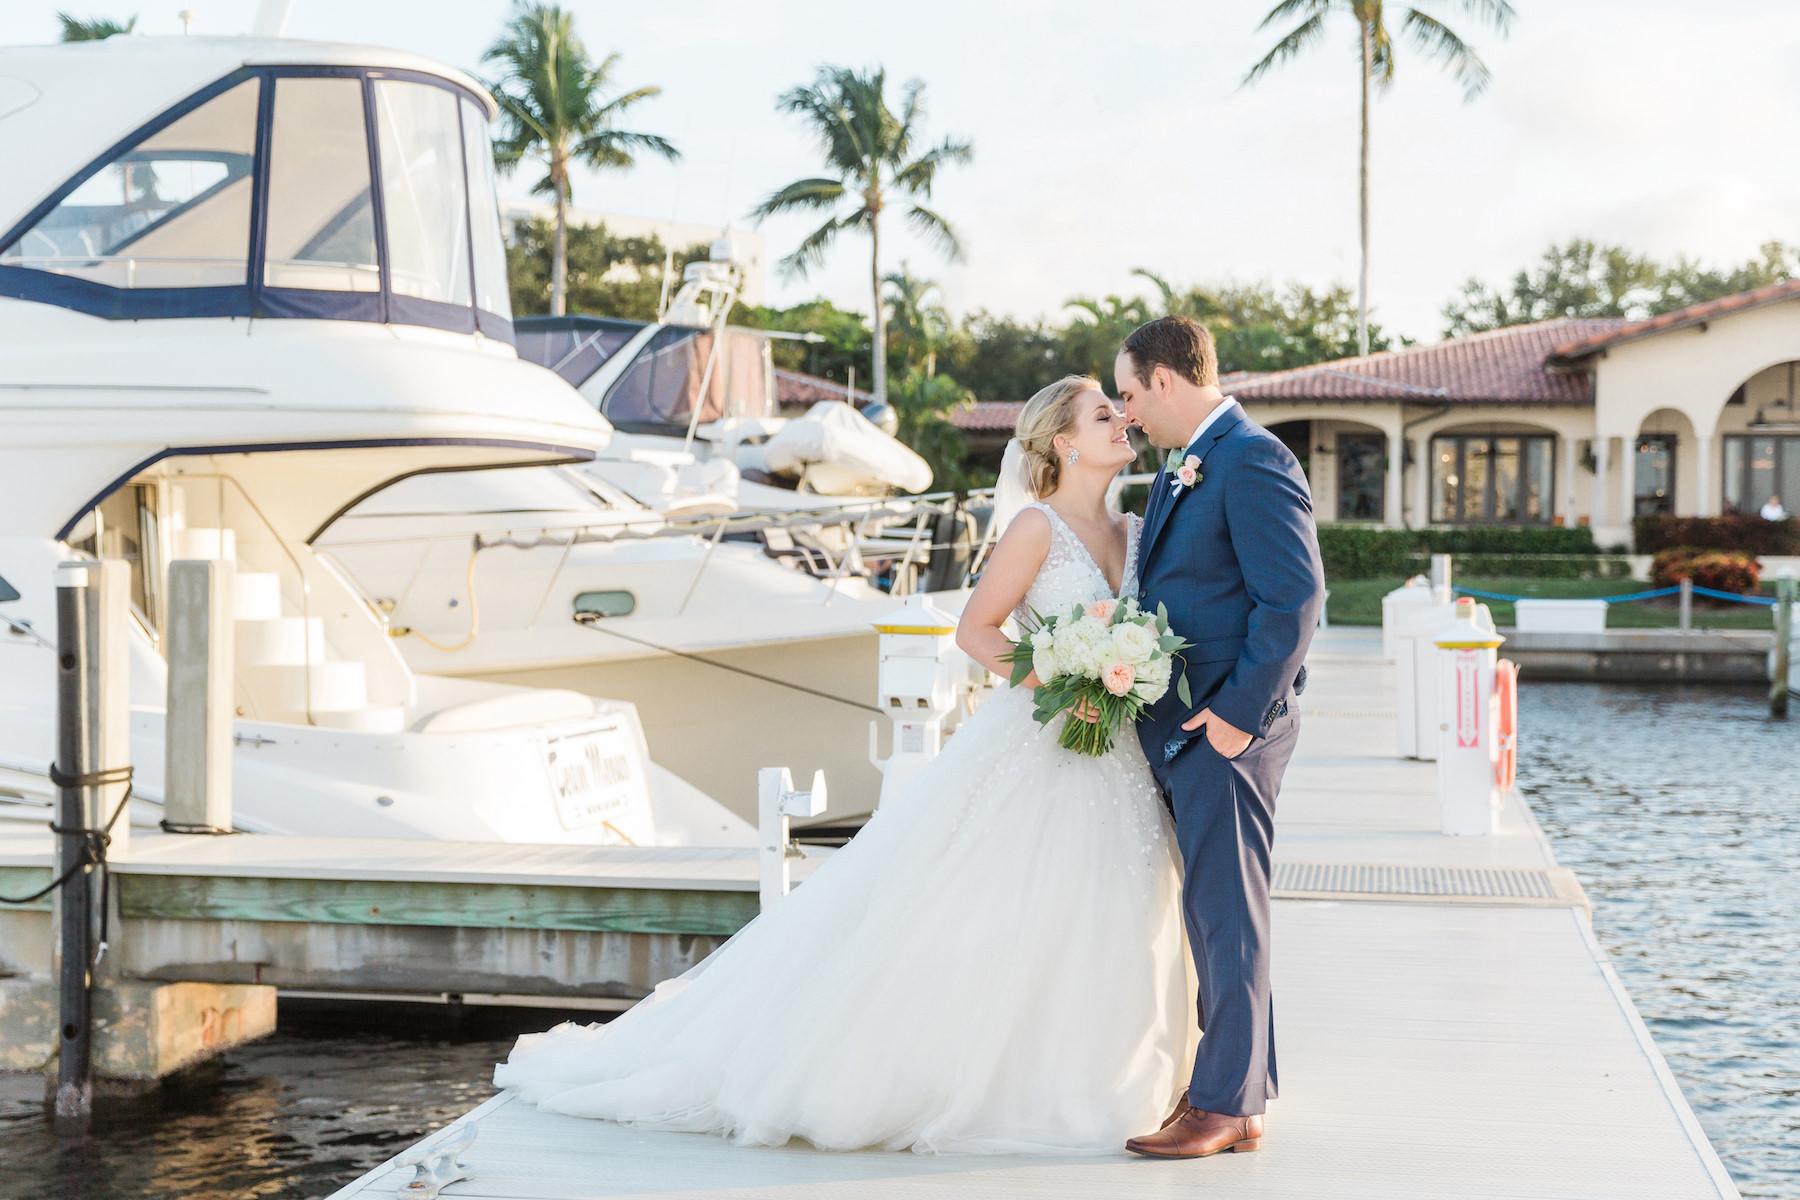 Destination Florida Bride and Groom Waterfront Marina Wedding Portrait with Yacht | Sarasota Wedding Venue The Resort at Longboat Key Club